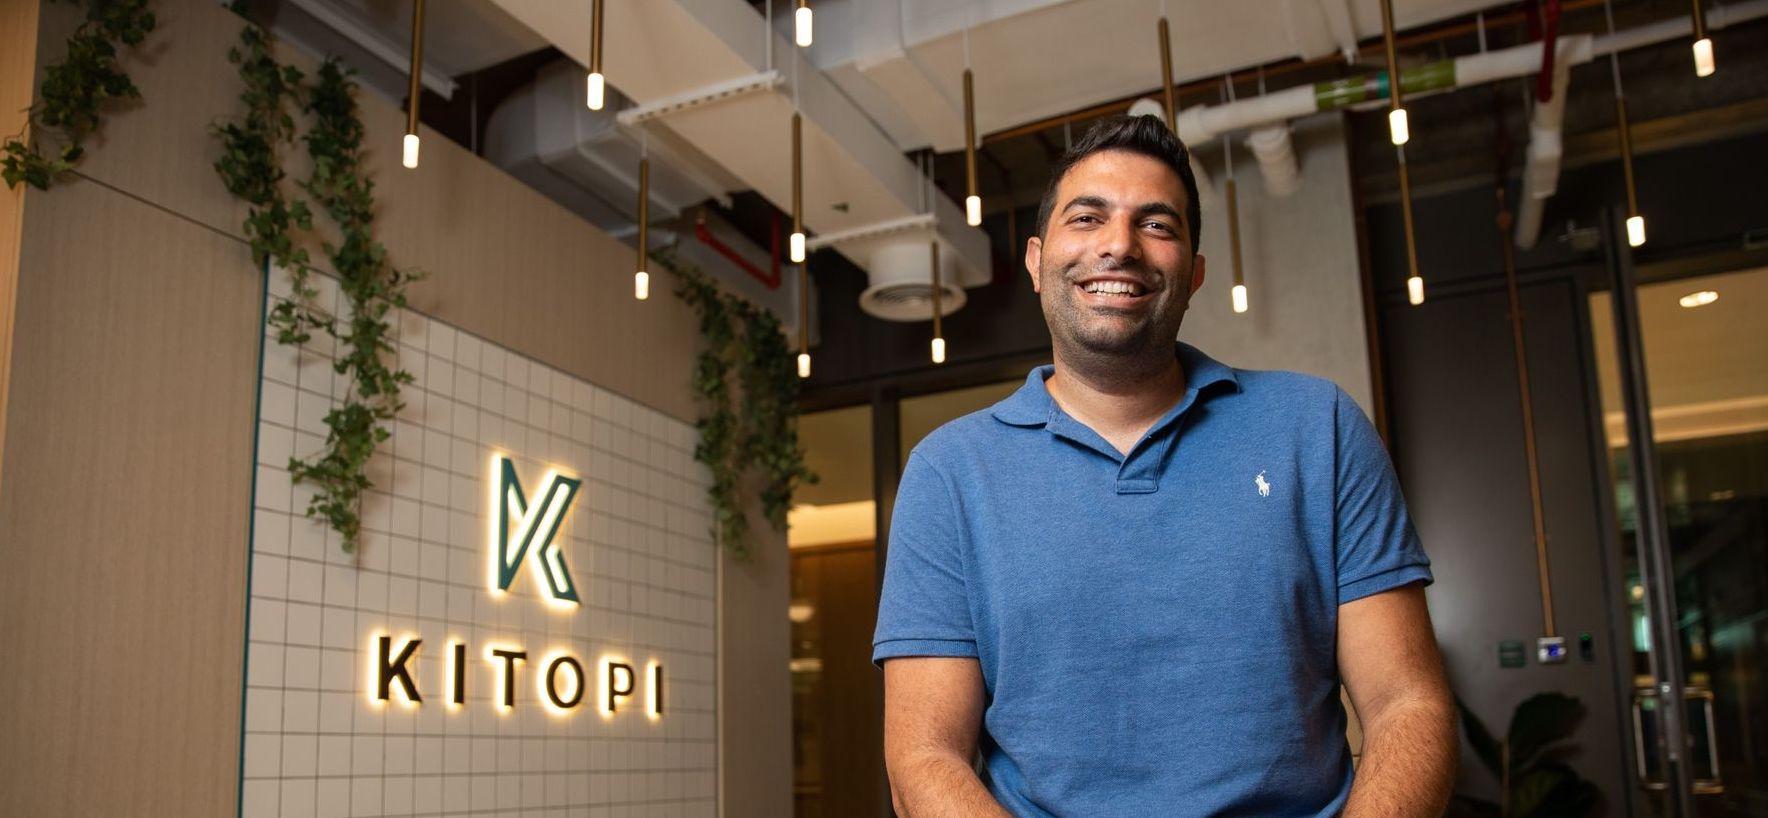 Kitopi's Valuation Reaches $1 Billion Following Series C Funding